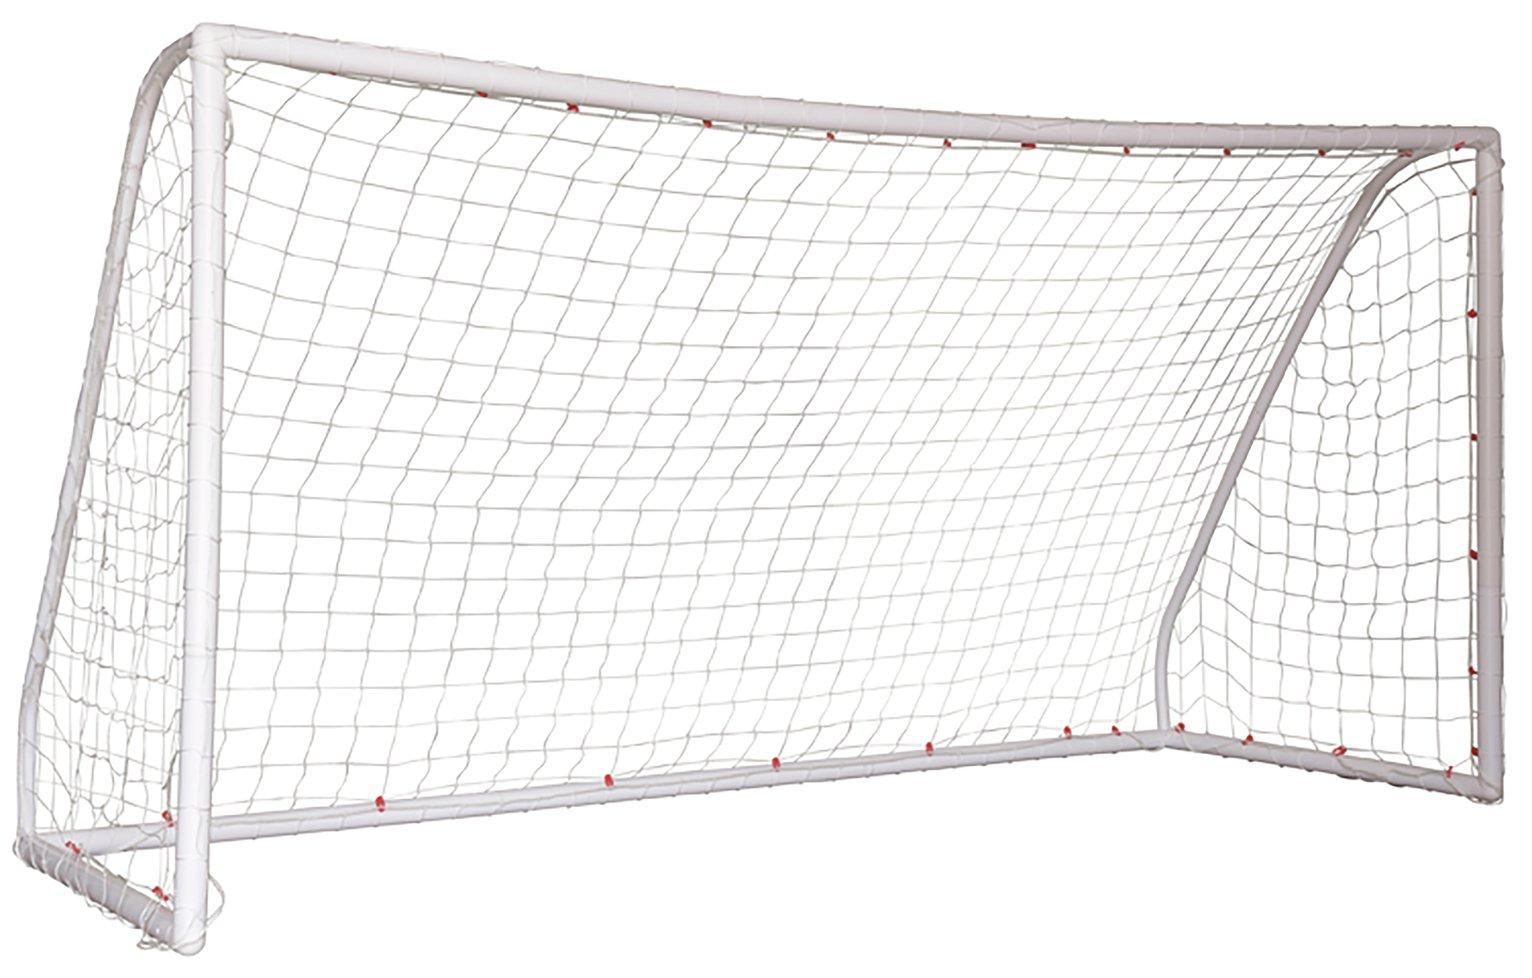 Buy Opti 12 X 6ft Premium Quality Goal Football Goals Argos